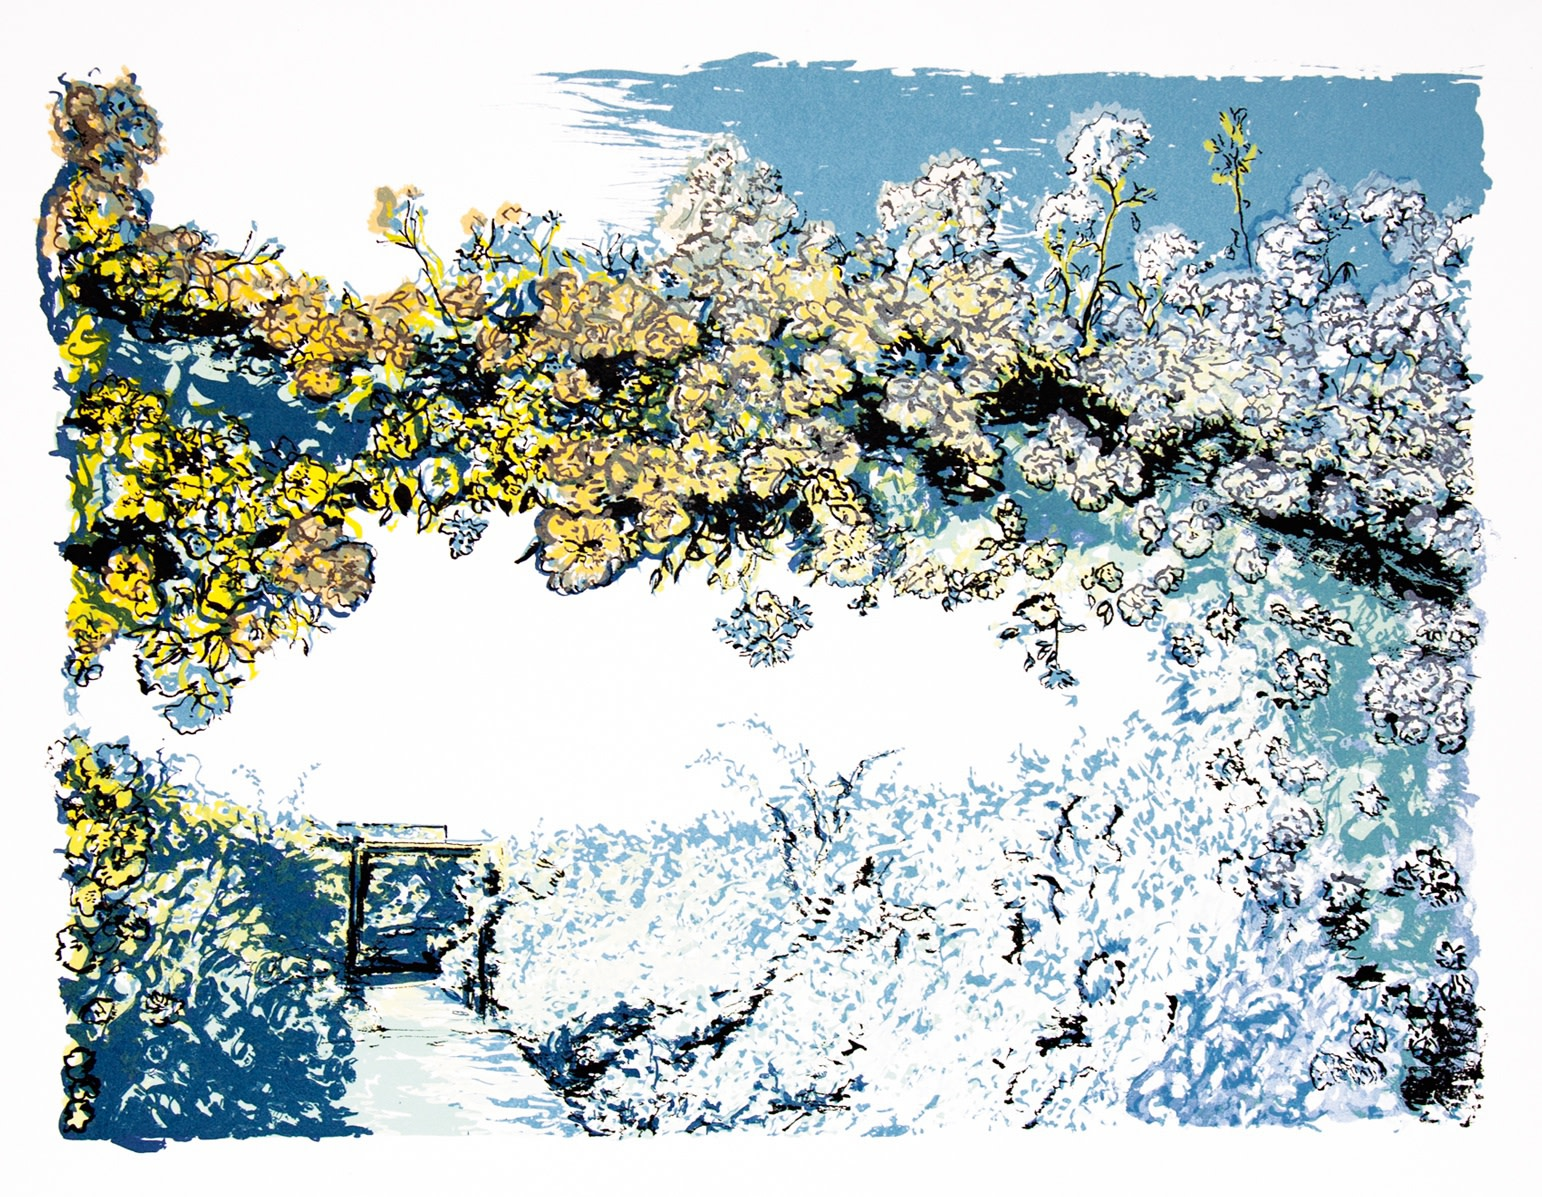 "<span class=""link fancybox-details-link""><a href=""/artists/321-denise-ballard-wyllie-are/works/11523/"">View Detail Page</a></span><div class=""artist""><span class=""artist""><strong>Denise Ballard Wyllie ARE</strong></span></div><div class=""title""><em>Long Summer Garden</em></div><div class=""medium"">screenprint</div><div class=""dimensions"">56 x 78 cm framed<br /> 41 x 55 cm image size</div><div class=""edition_details"">edition of 8</div><div class=""price"">£640.00 framed<br>£440.00 unframed</div>"